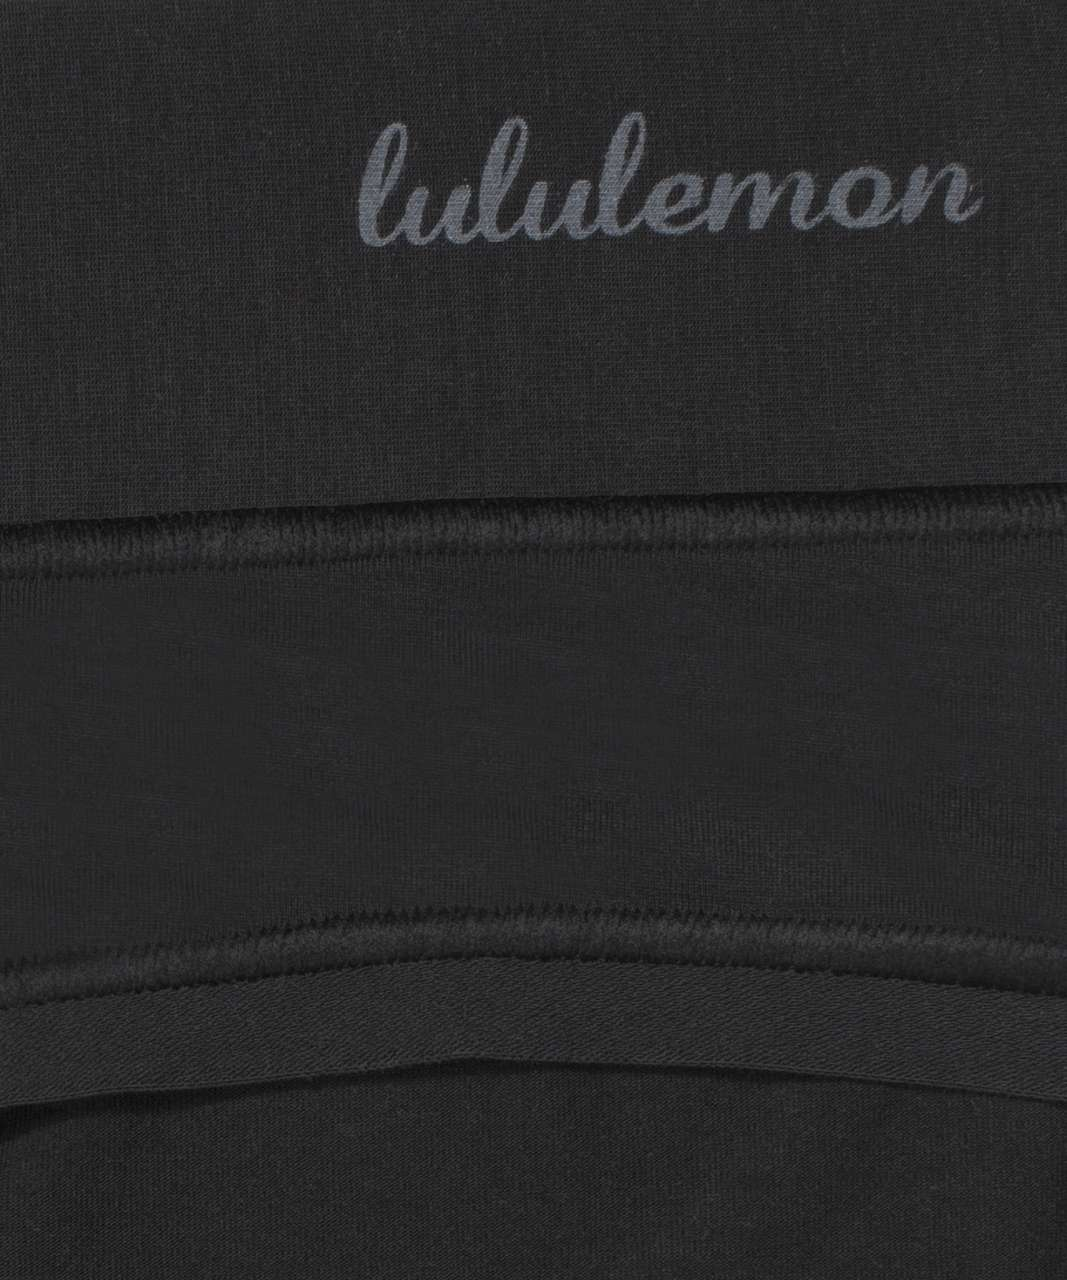 Lululemon Soft Breathable Bikini *3 Pack - Black / Misty Shell / Soft Sand